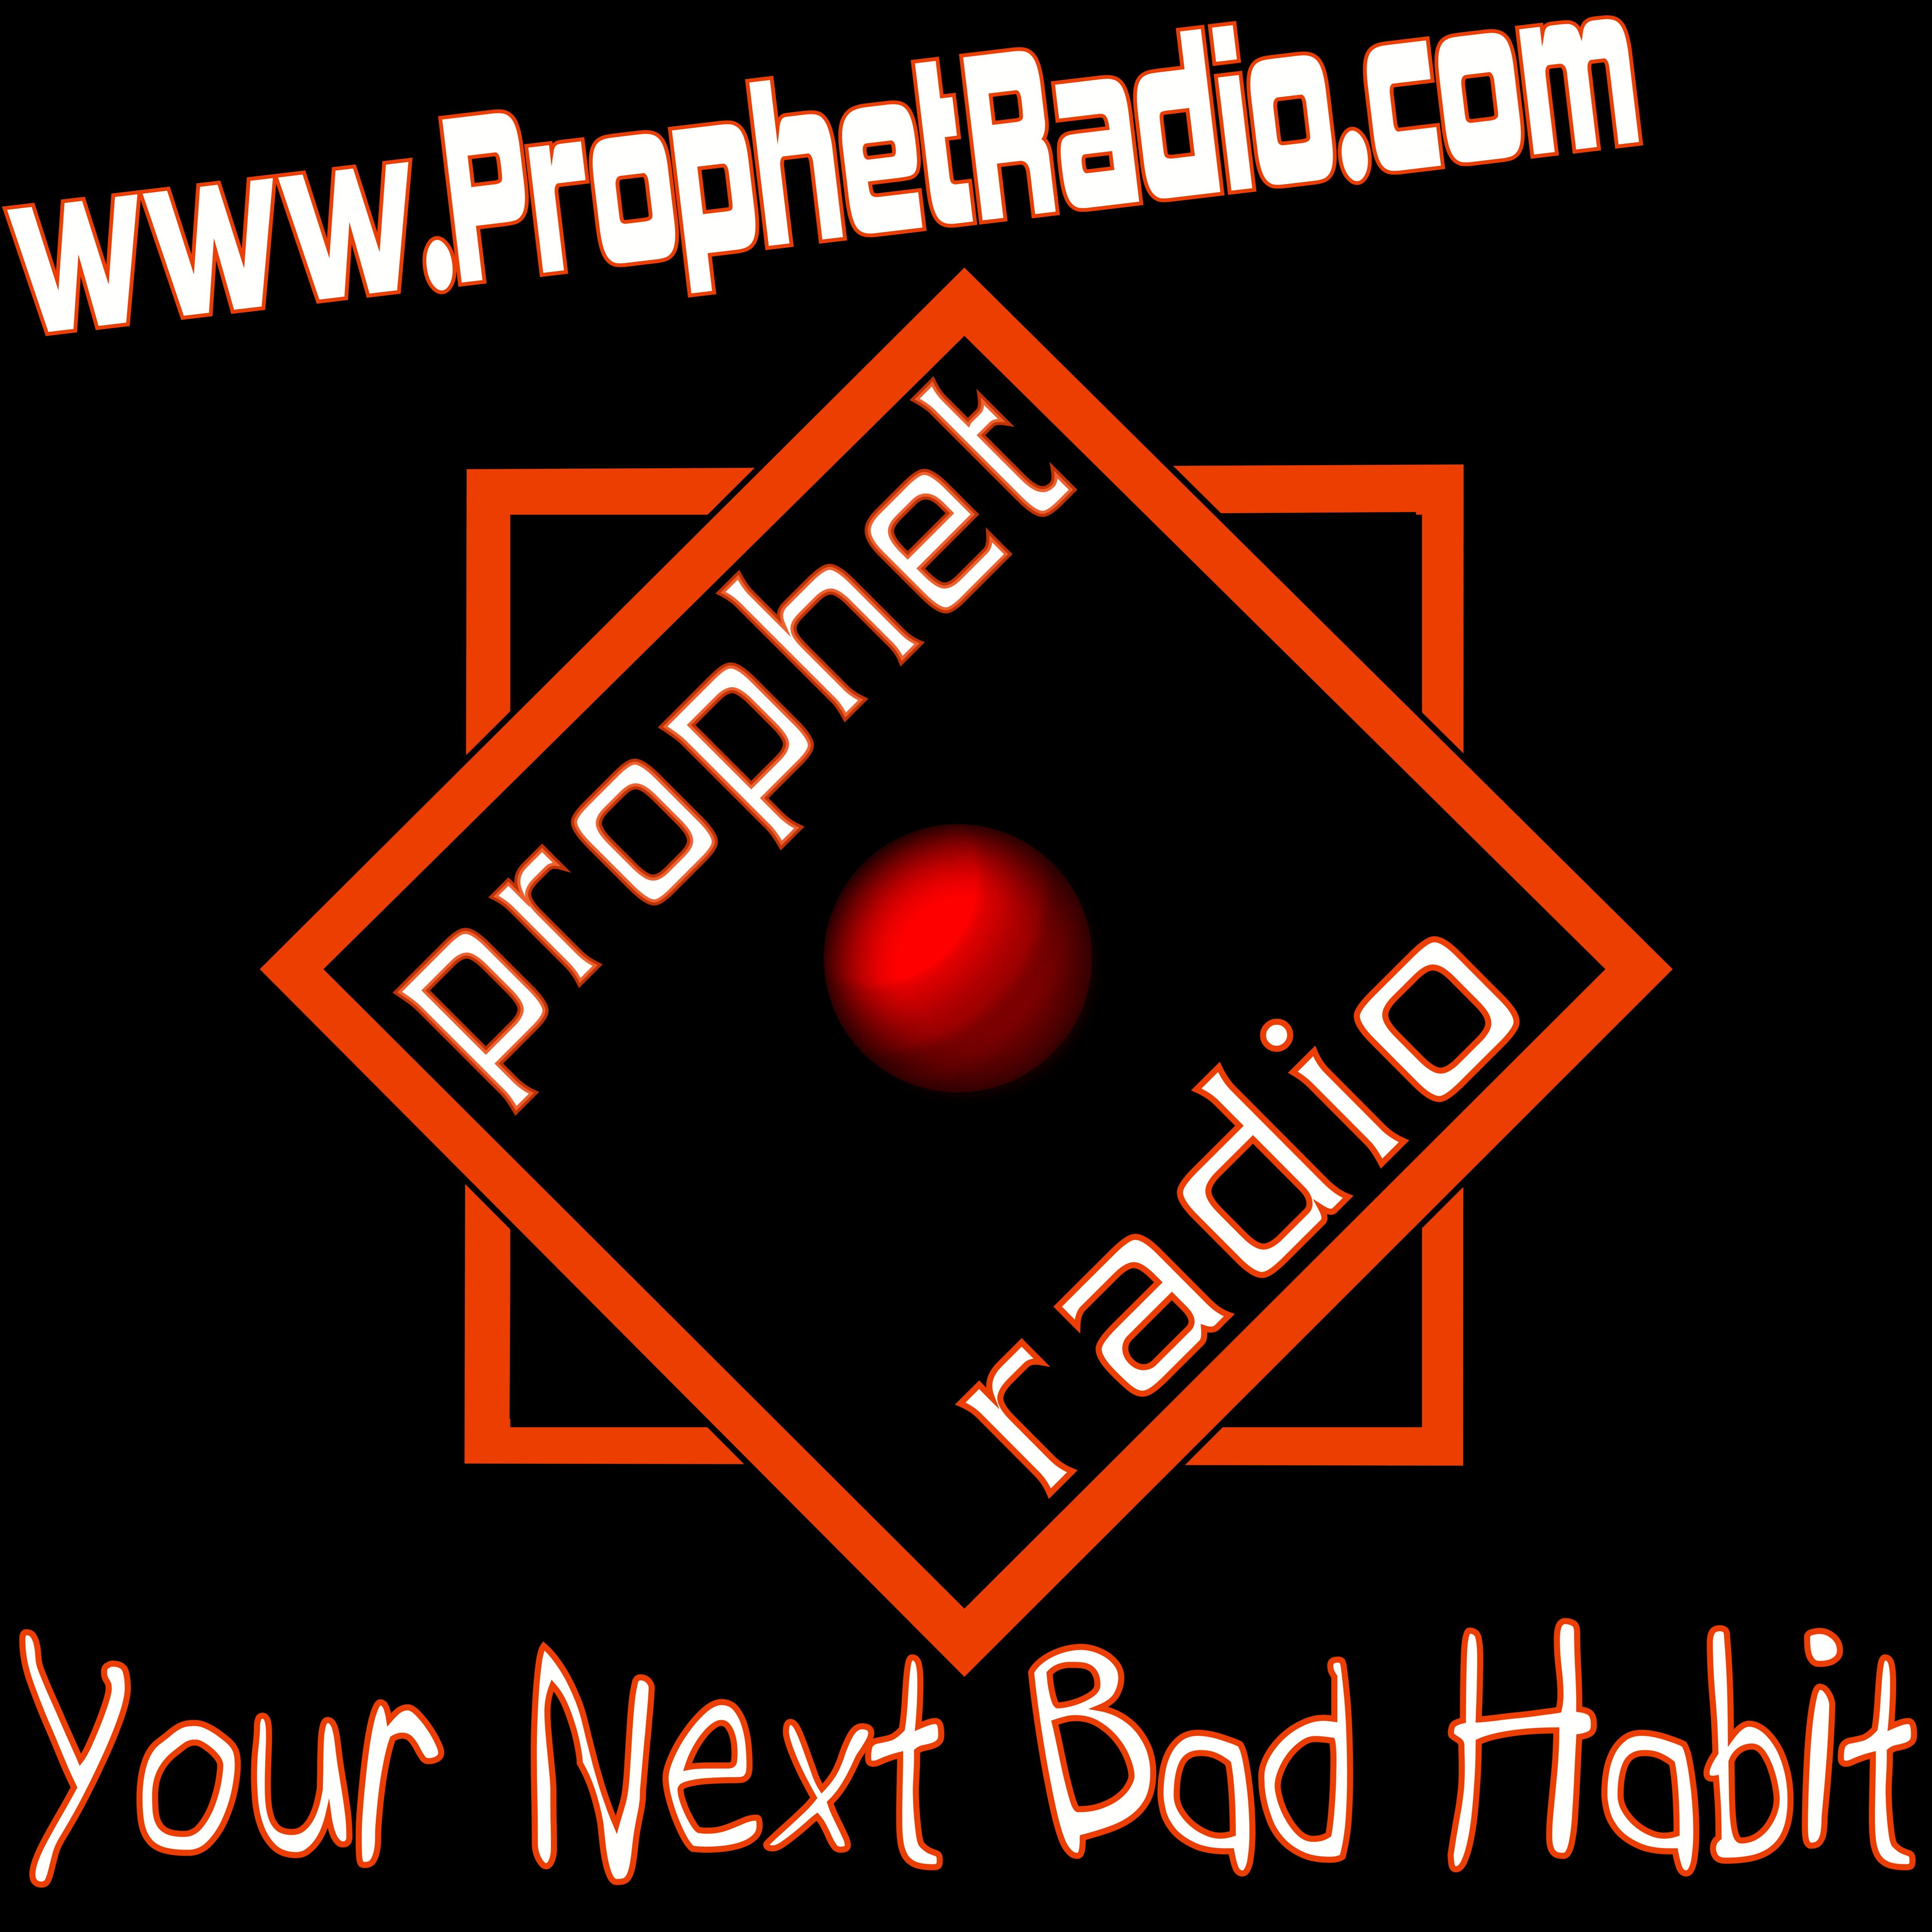 ProphetRadio.com